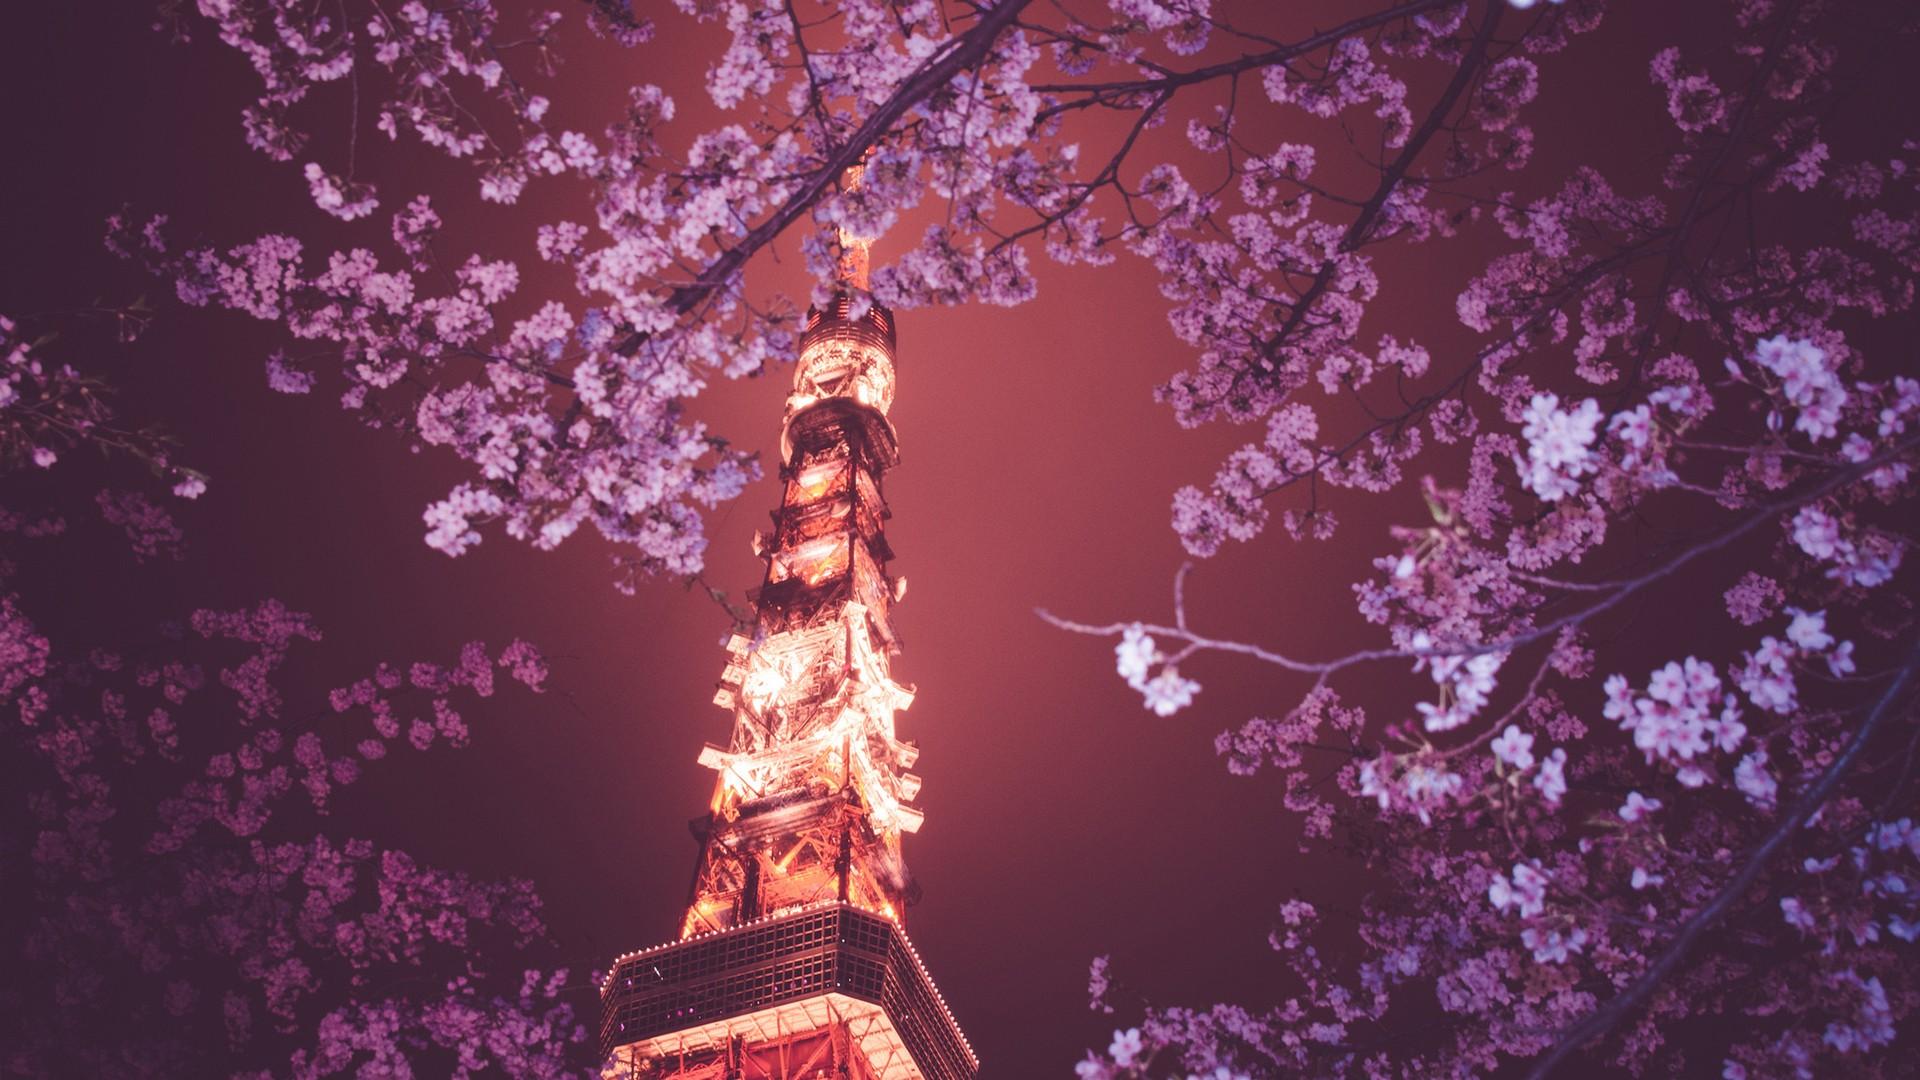 Fantastic Wallpaper Night Cherry Blossom - Japan-night-branch-cherry-blossom-blossom-spring-Tokyo-Tower-Hanami-tree-flower-plant-77534  Gallery.jpg